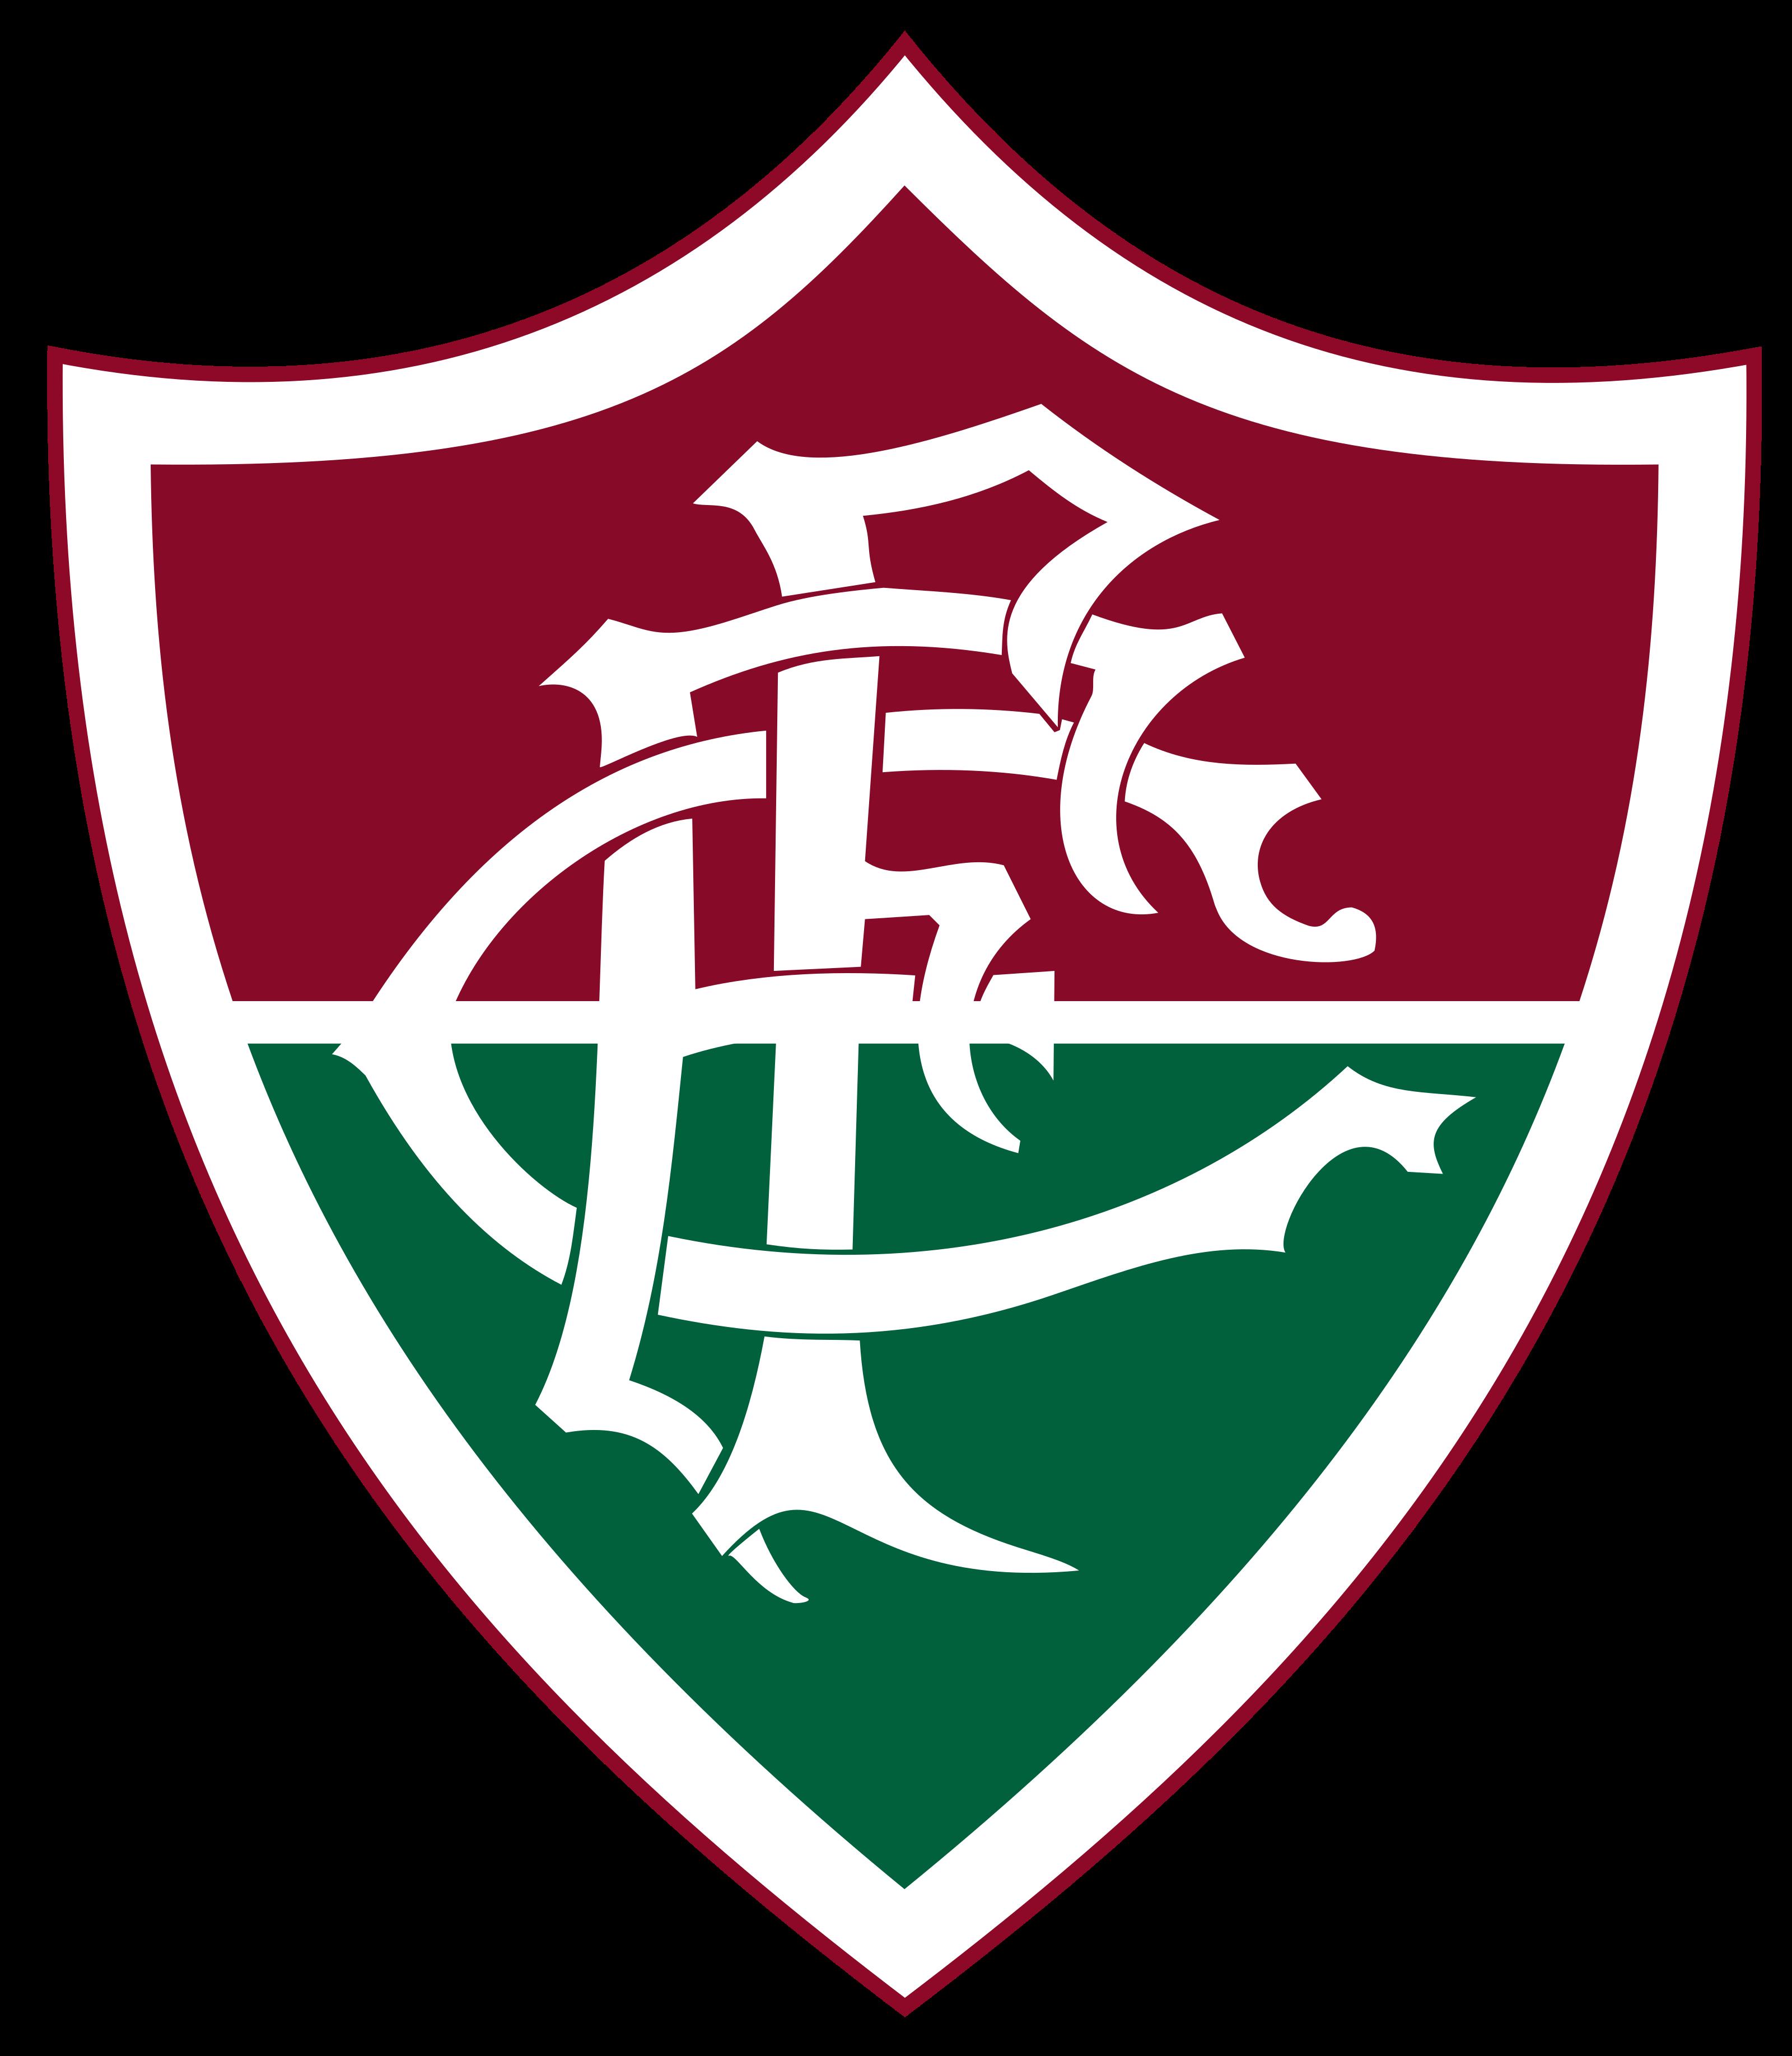 fluminense logo escudo 1 - Fluminense FC Logo